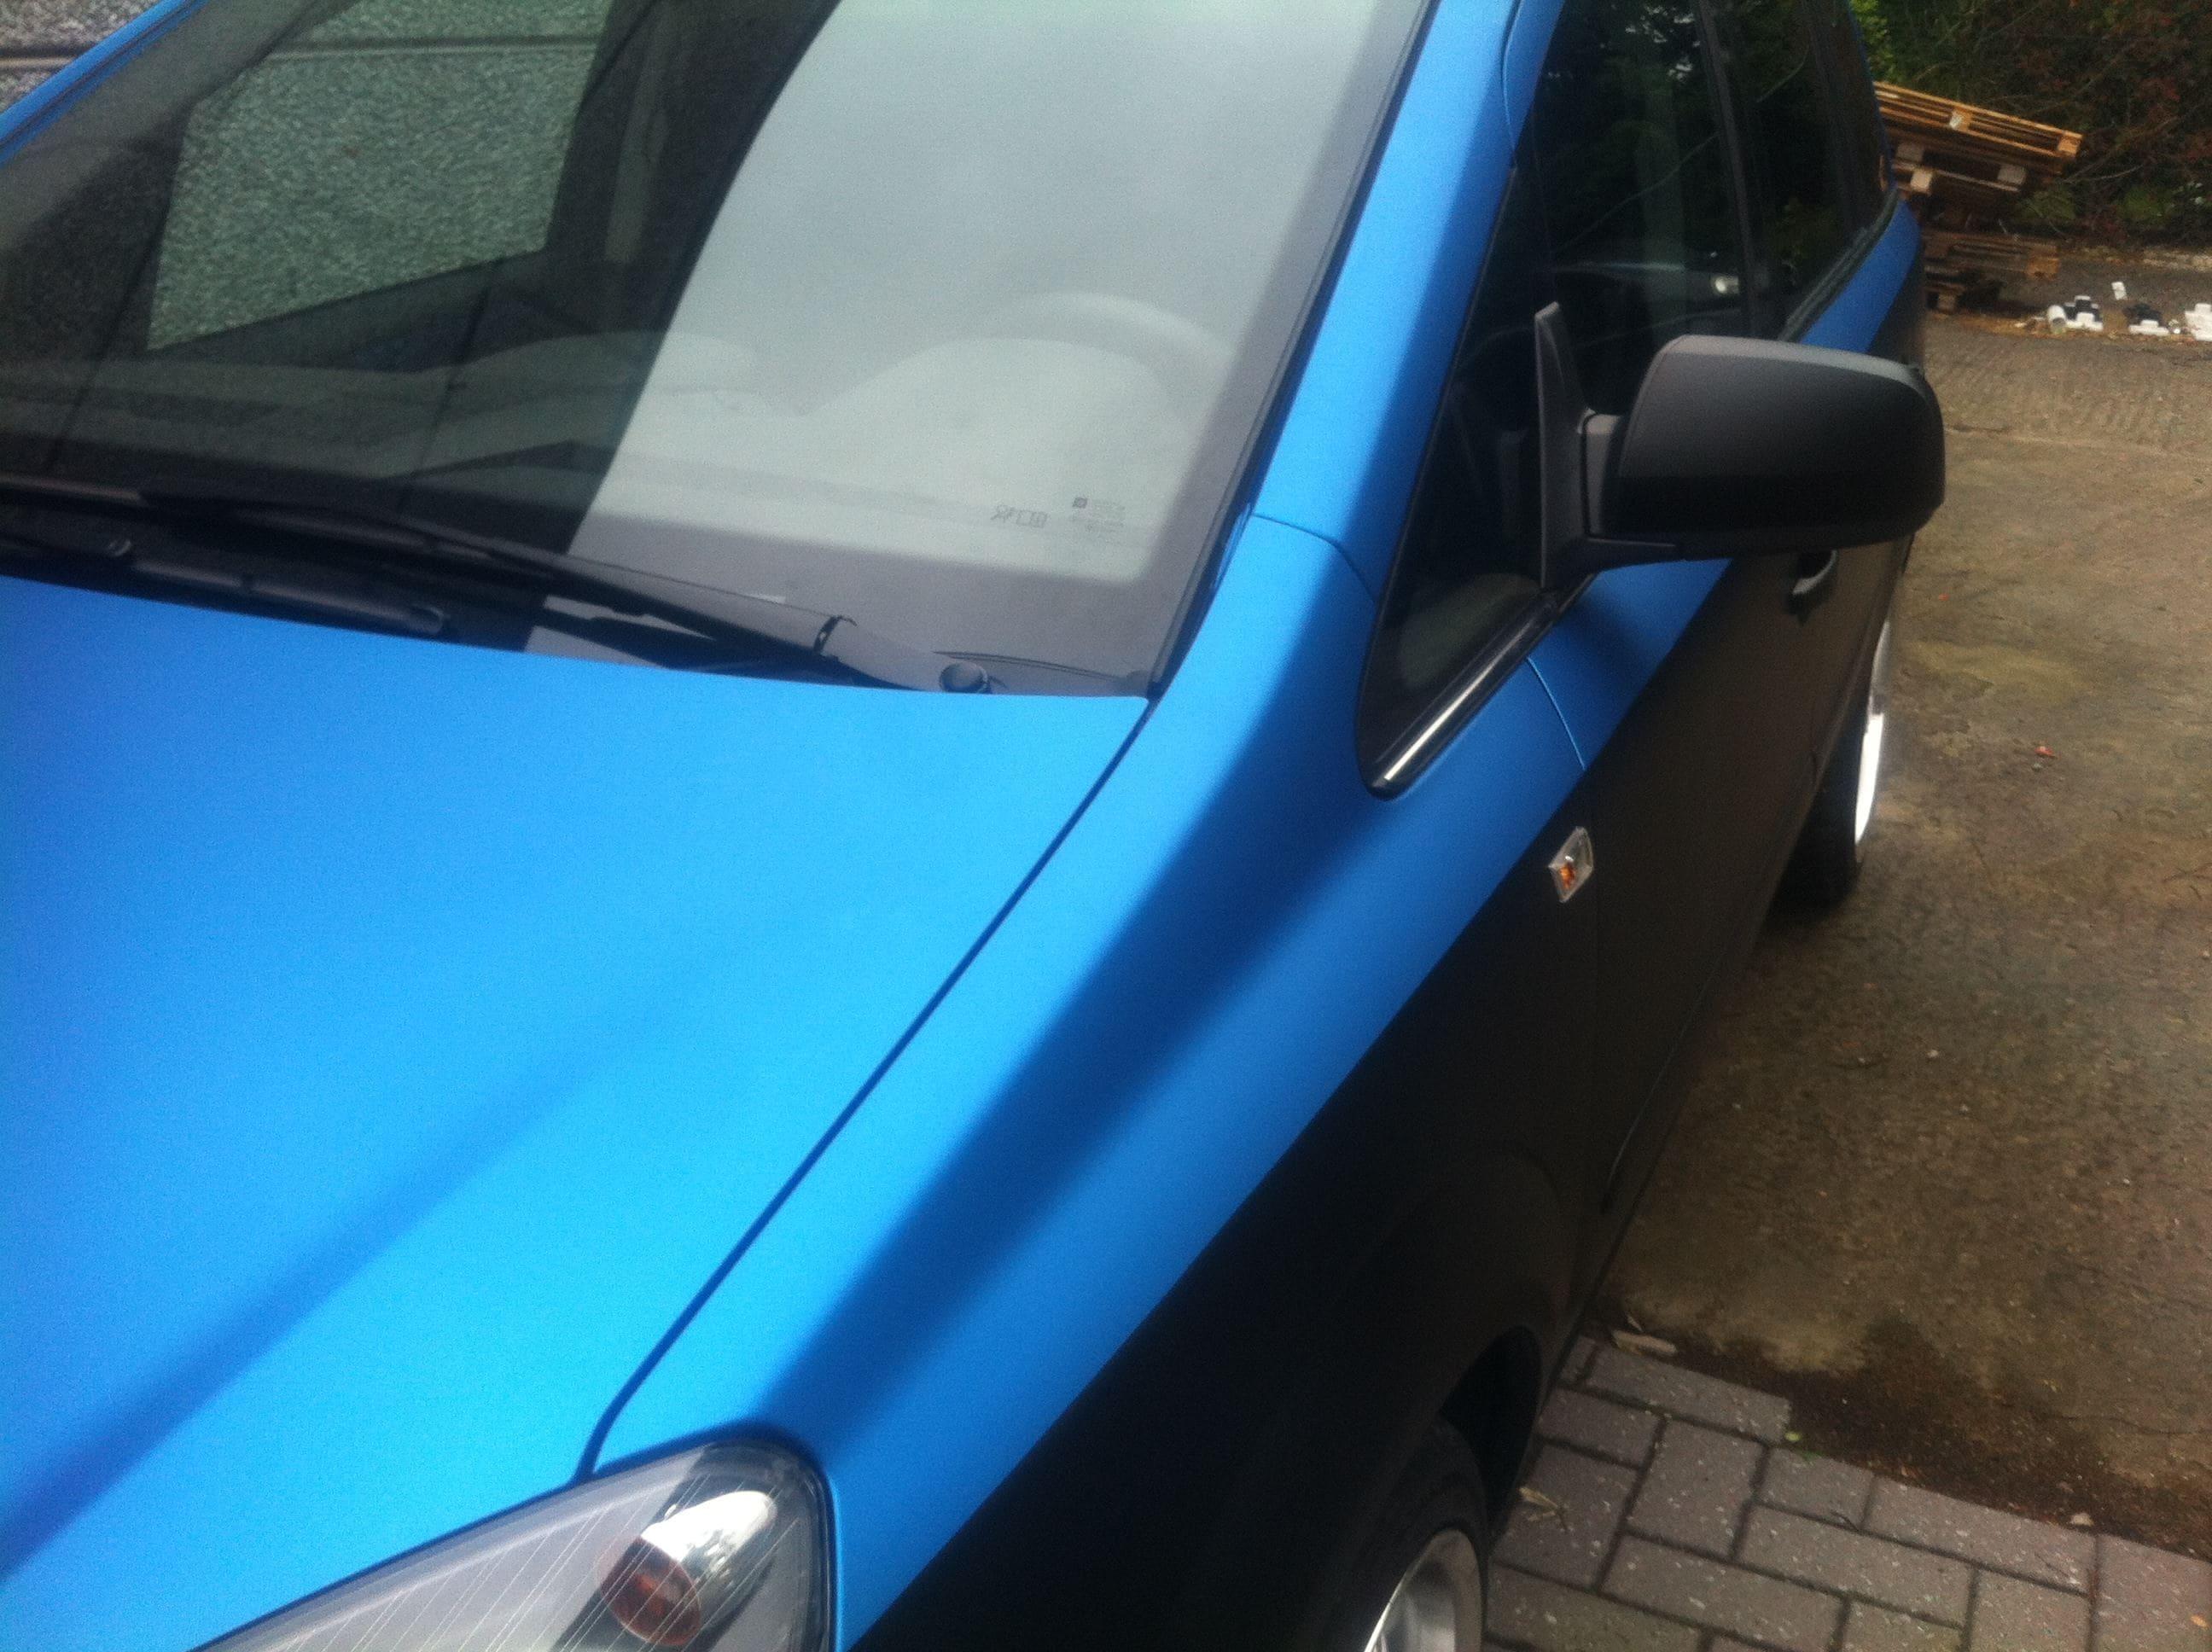 Opel Zafira met Two-Tone Wrap, Carwrapping door Wrapmyride.nu Foto-nr:6668, ©2021